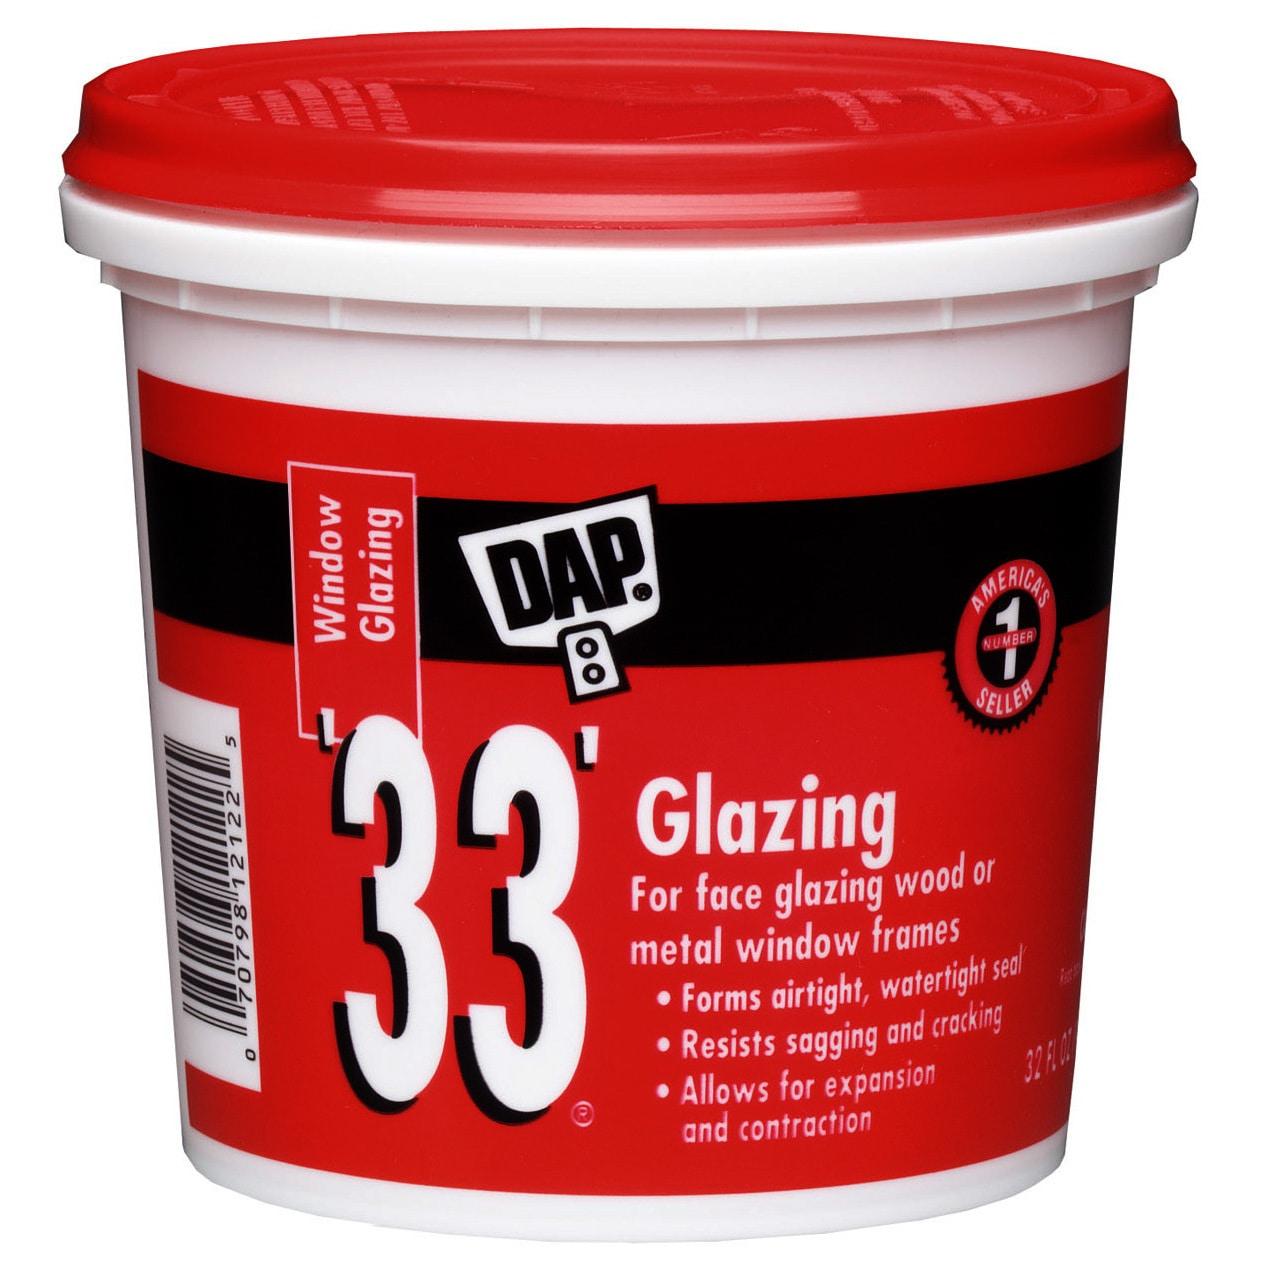 DAP 12122 1 Quart33 Glazing Compound White (Mirrors & Win...